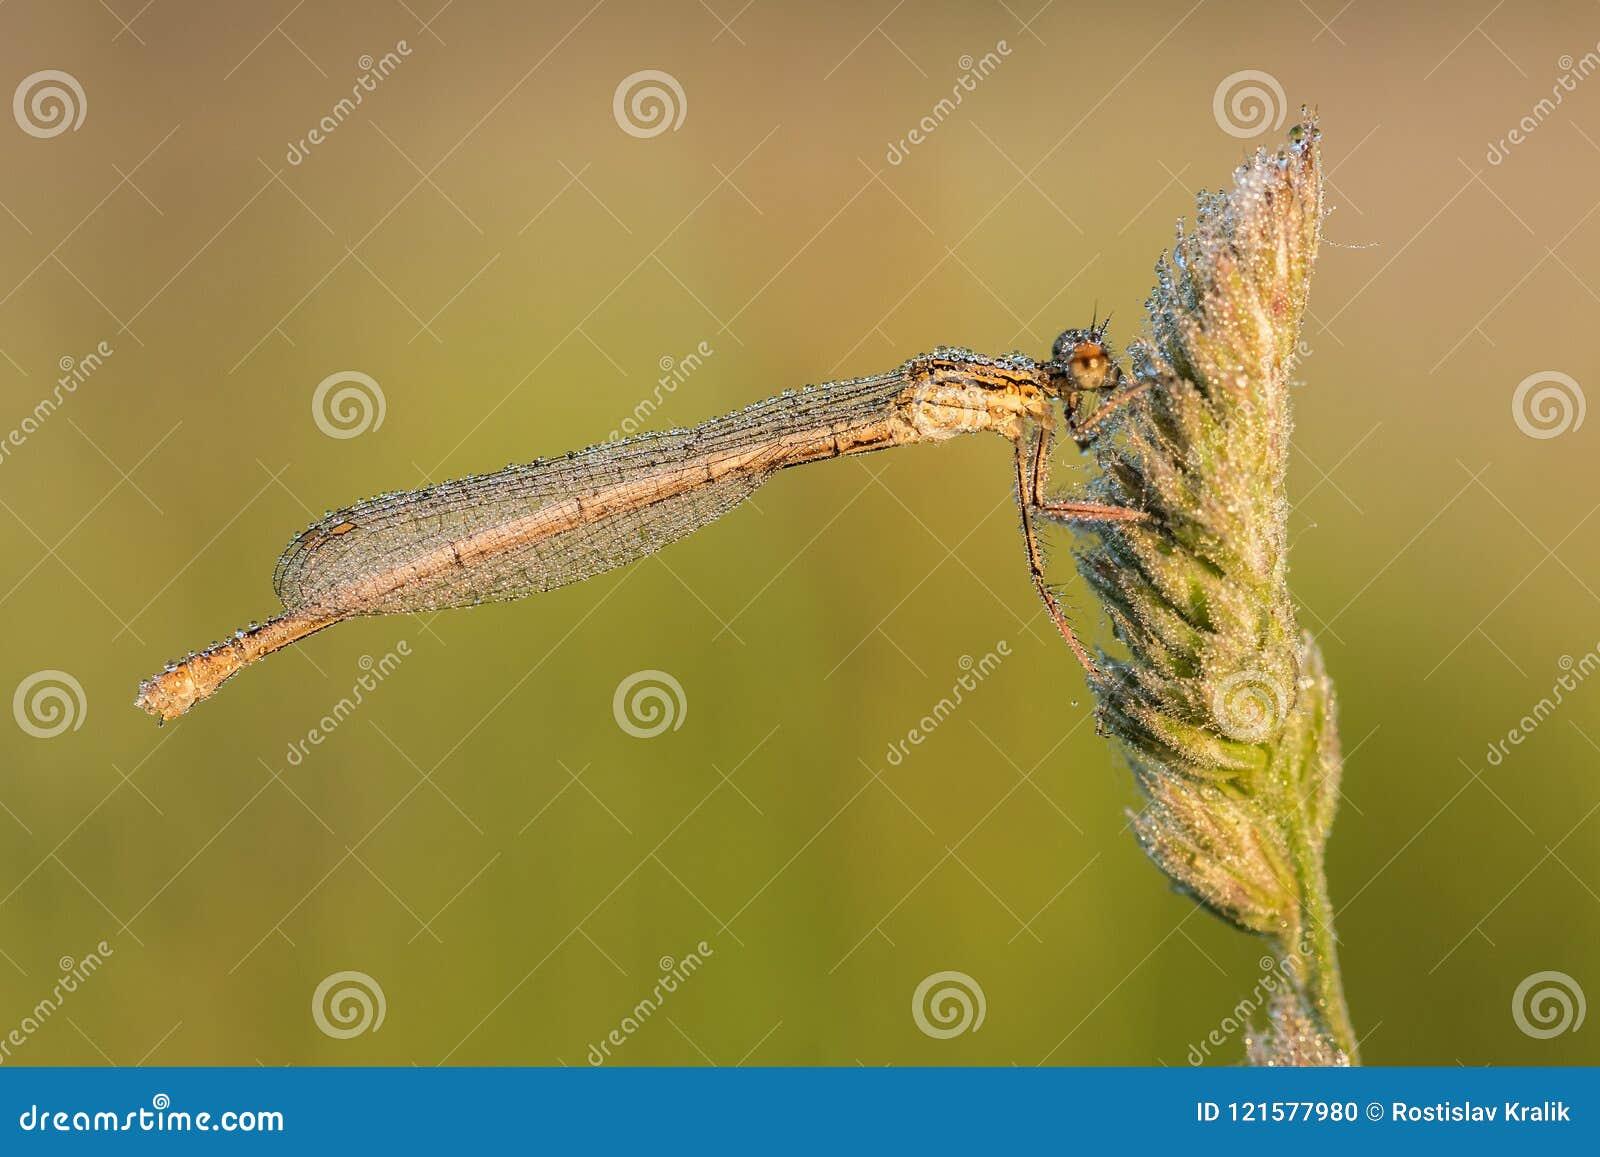 Wit-legged damselfly Platycnemis pennipes